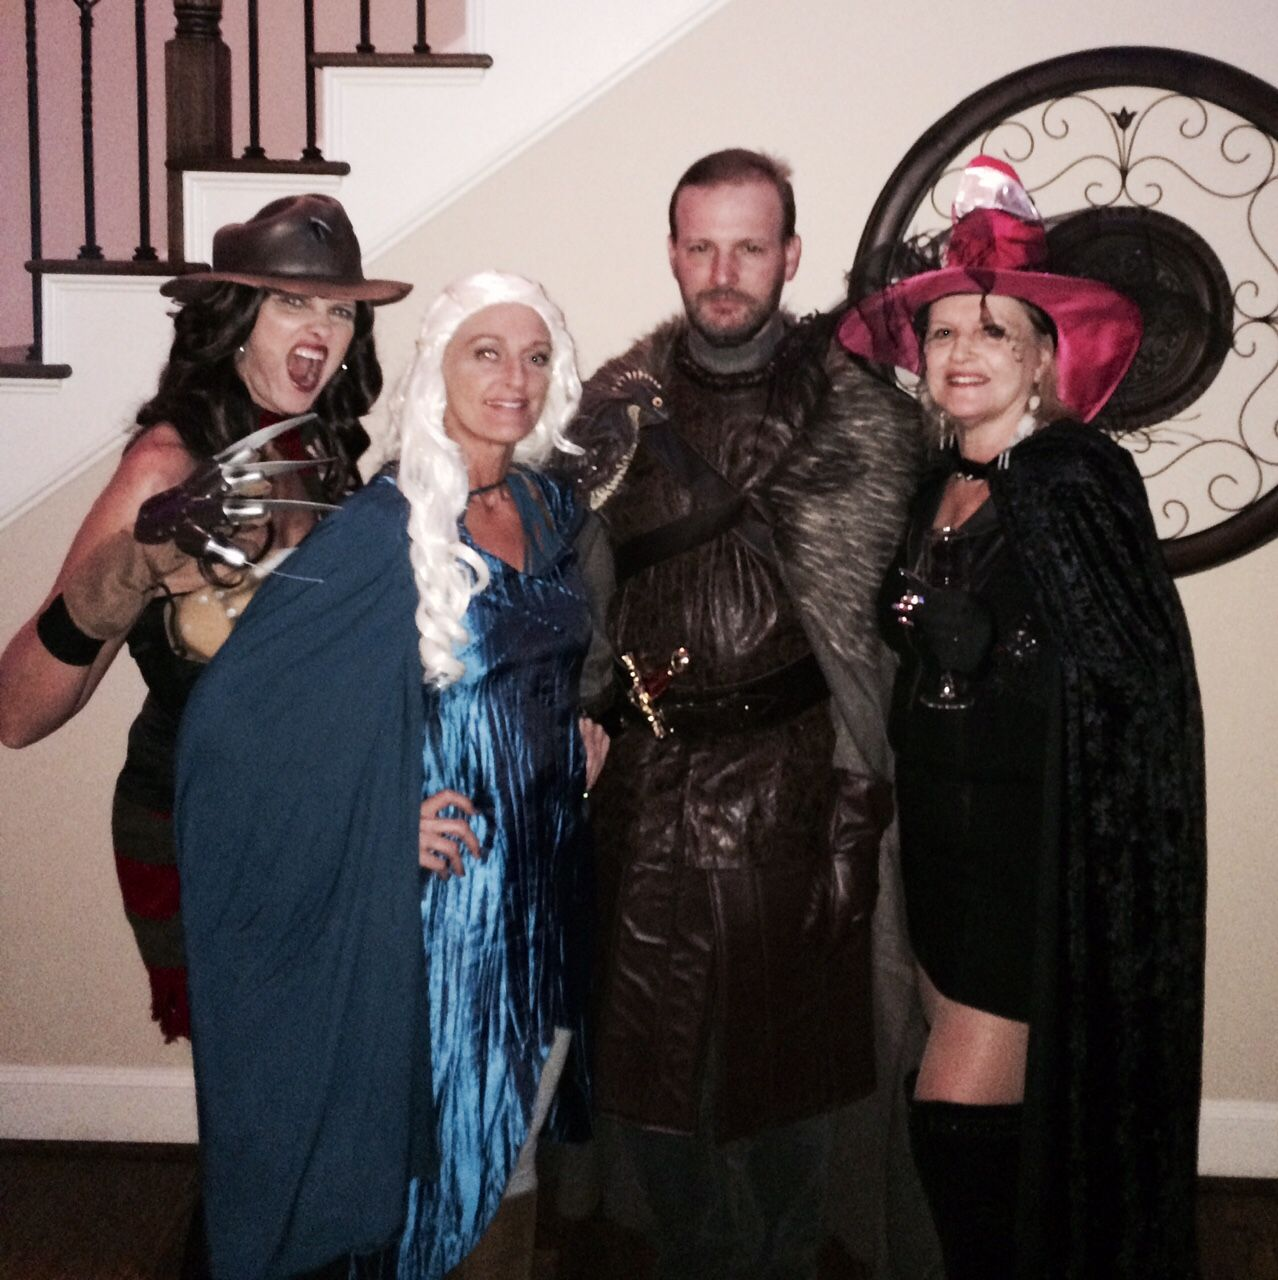 Game of Thrones! Costume contest, Halloween house